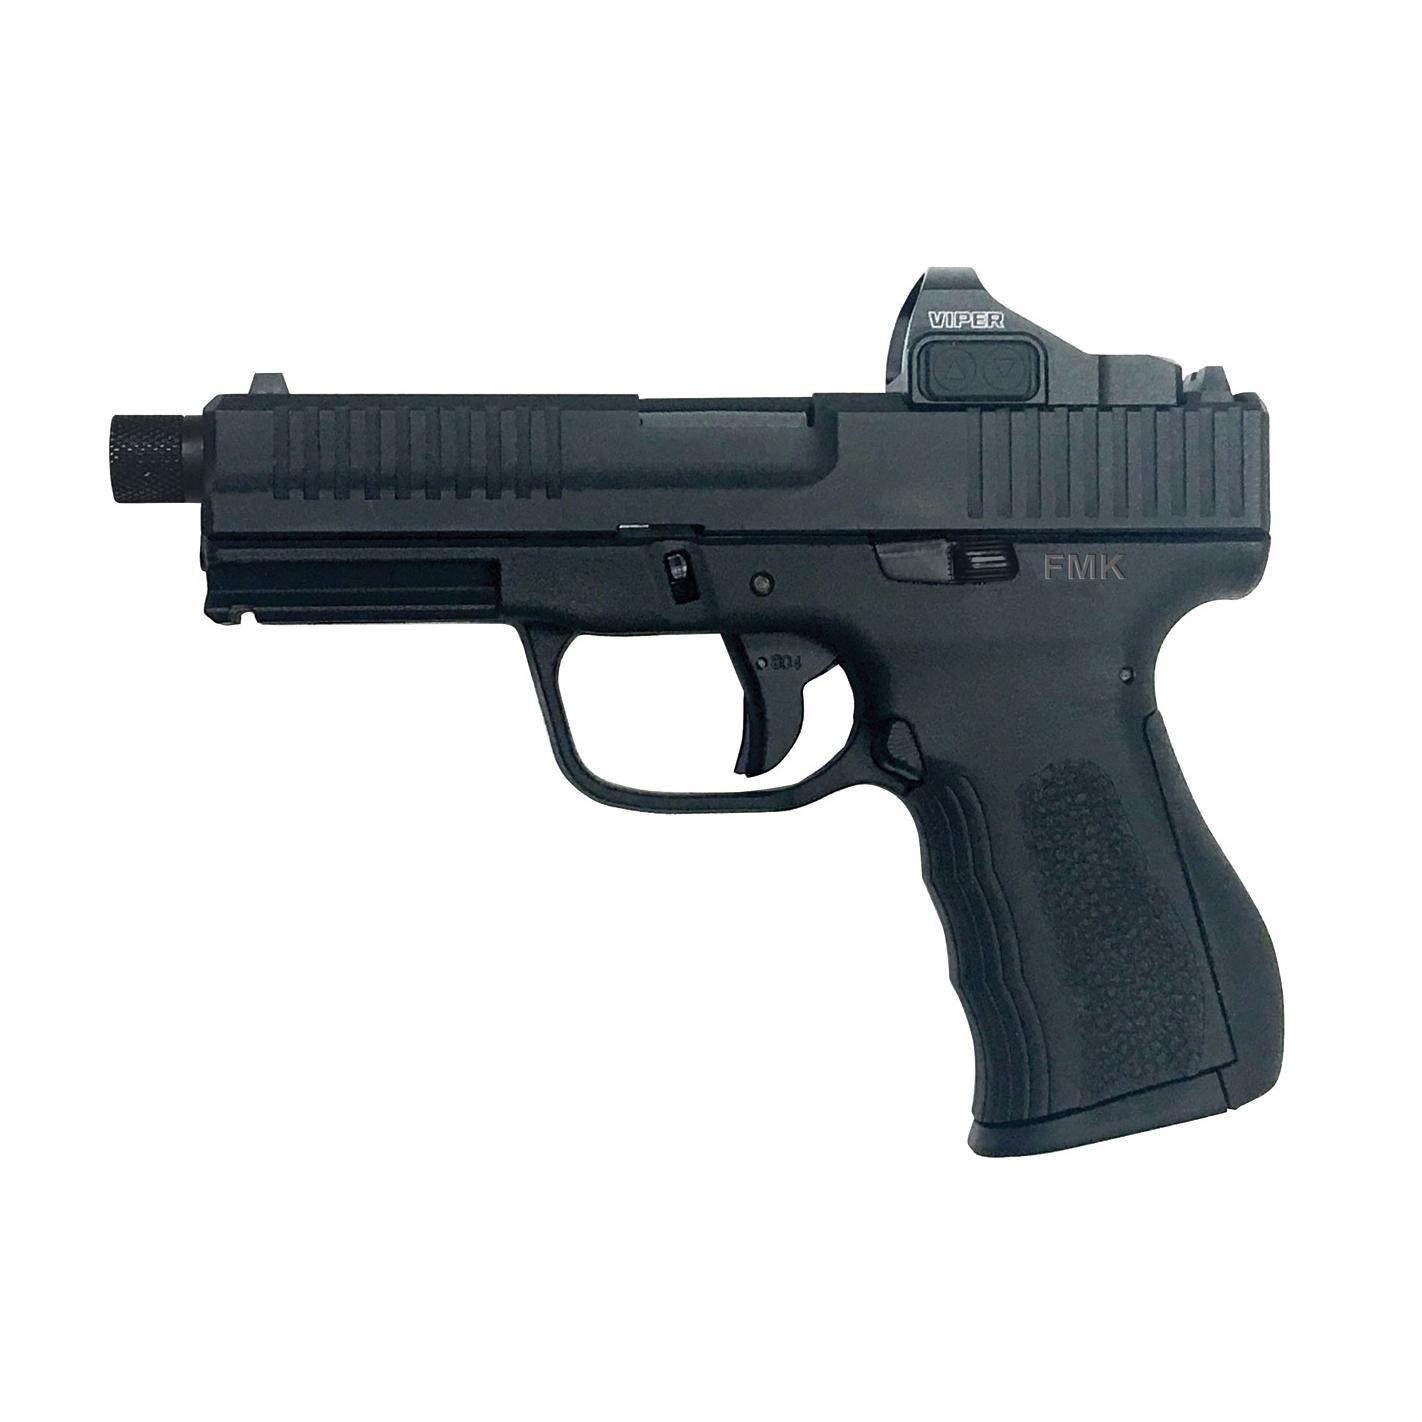 FMK Firearms 9C1 Elite Pro Plus Handgun Package